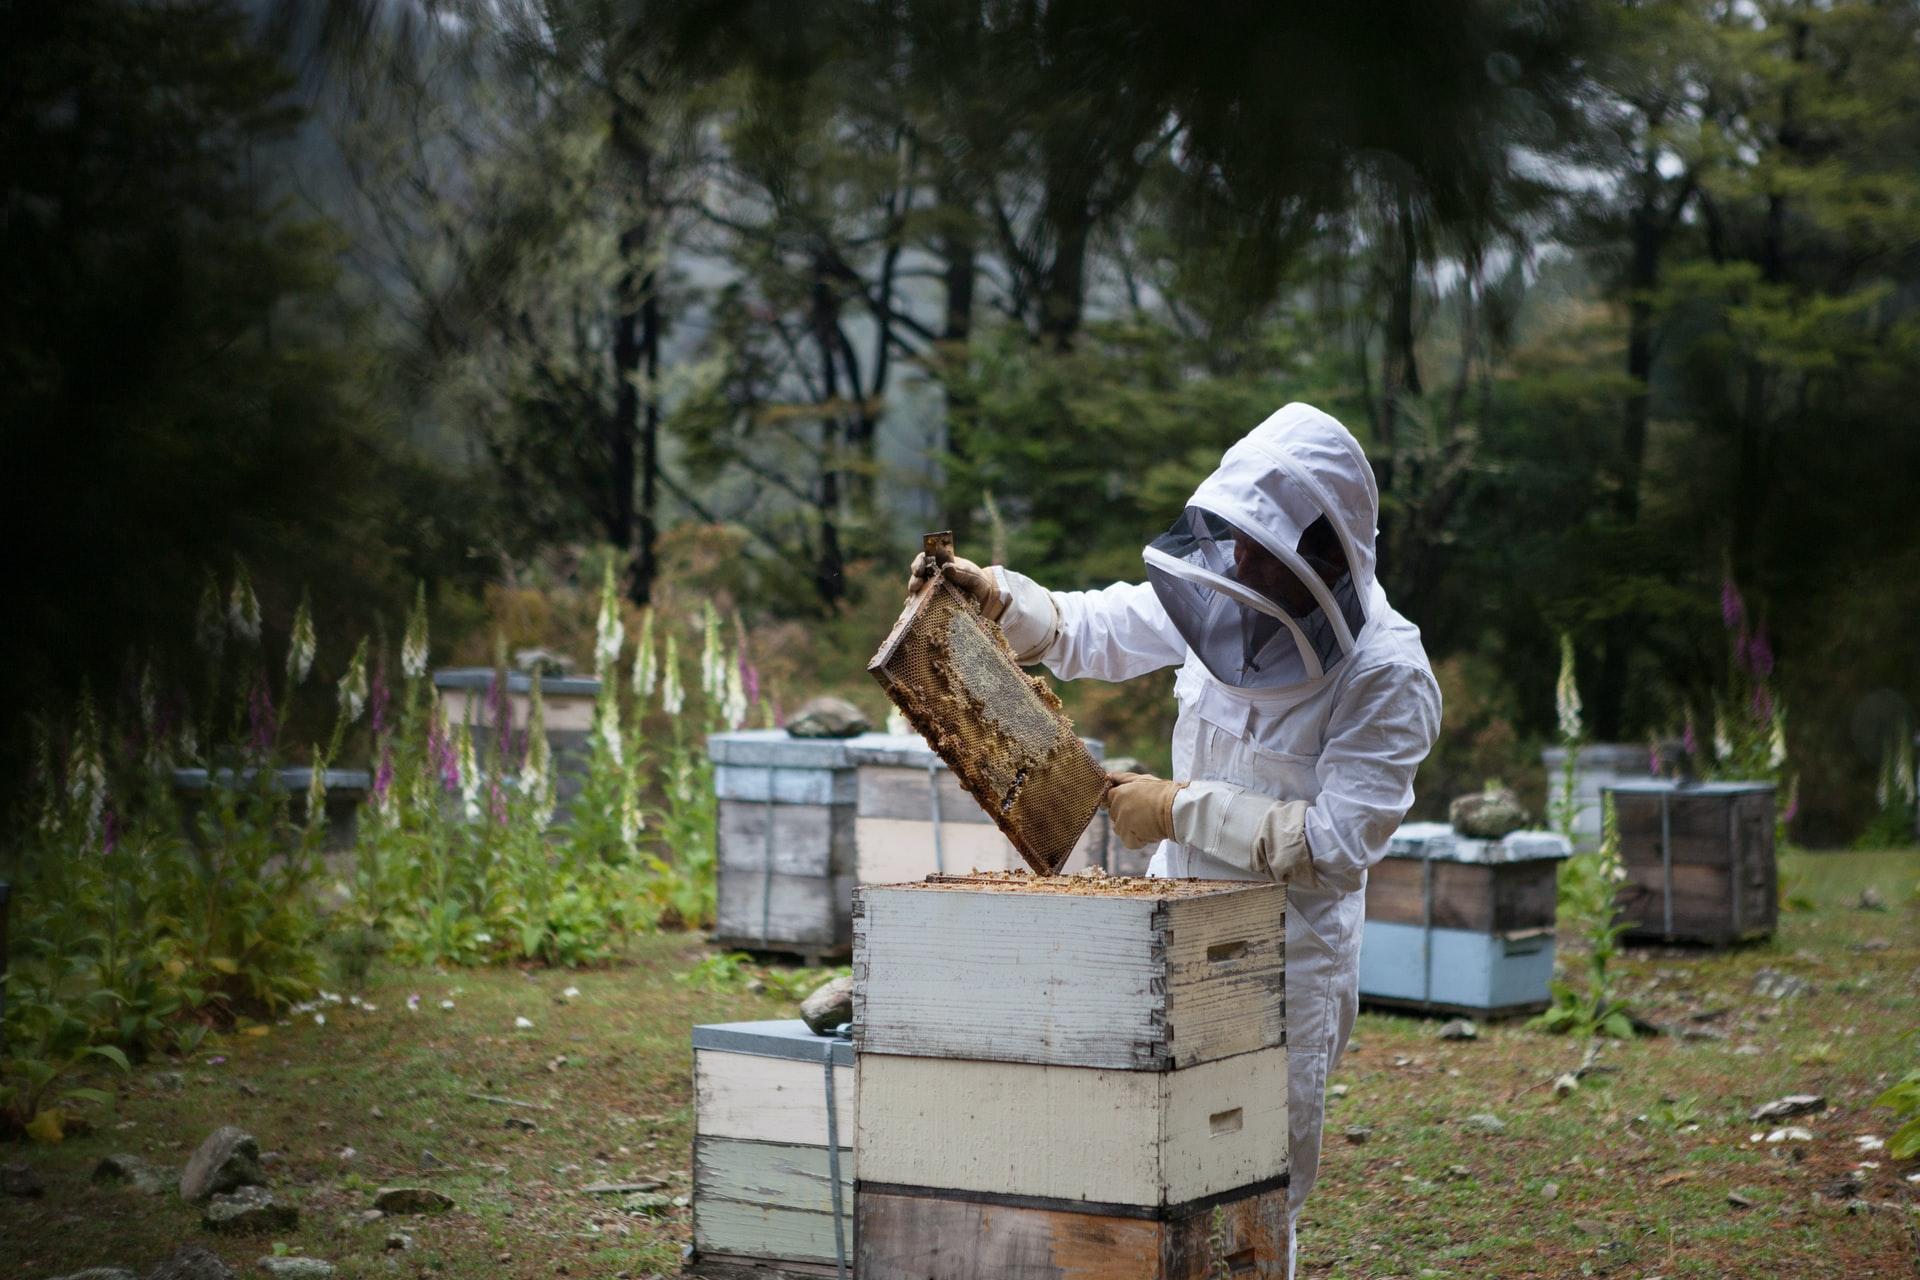 A beekeeper harvests honey